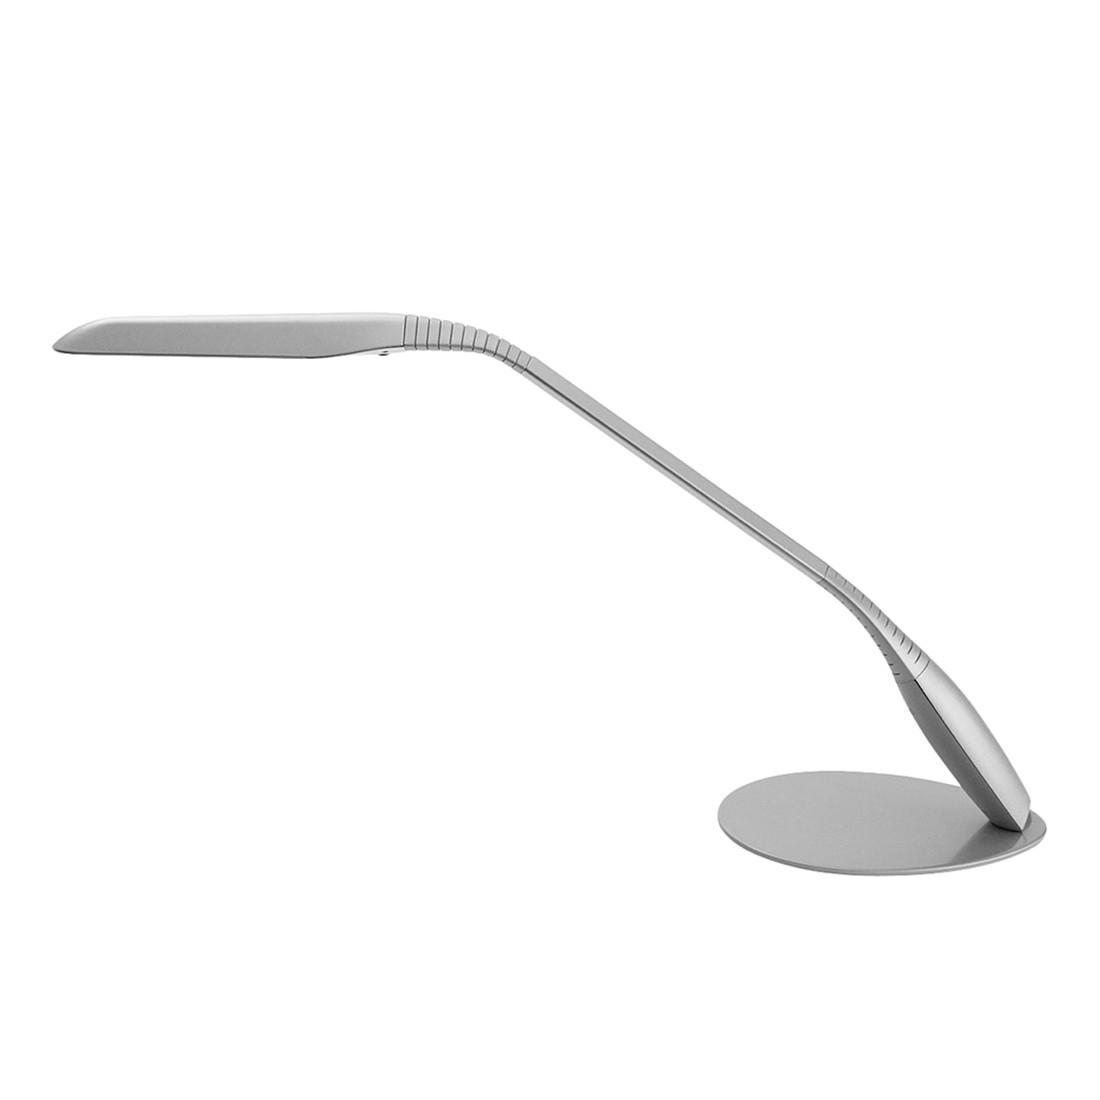 Tischleuchte IS 11 ● Metall/Kunststoff ● Grau ● 1-flammig- Blanke Design A